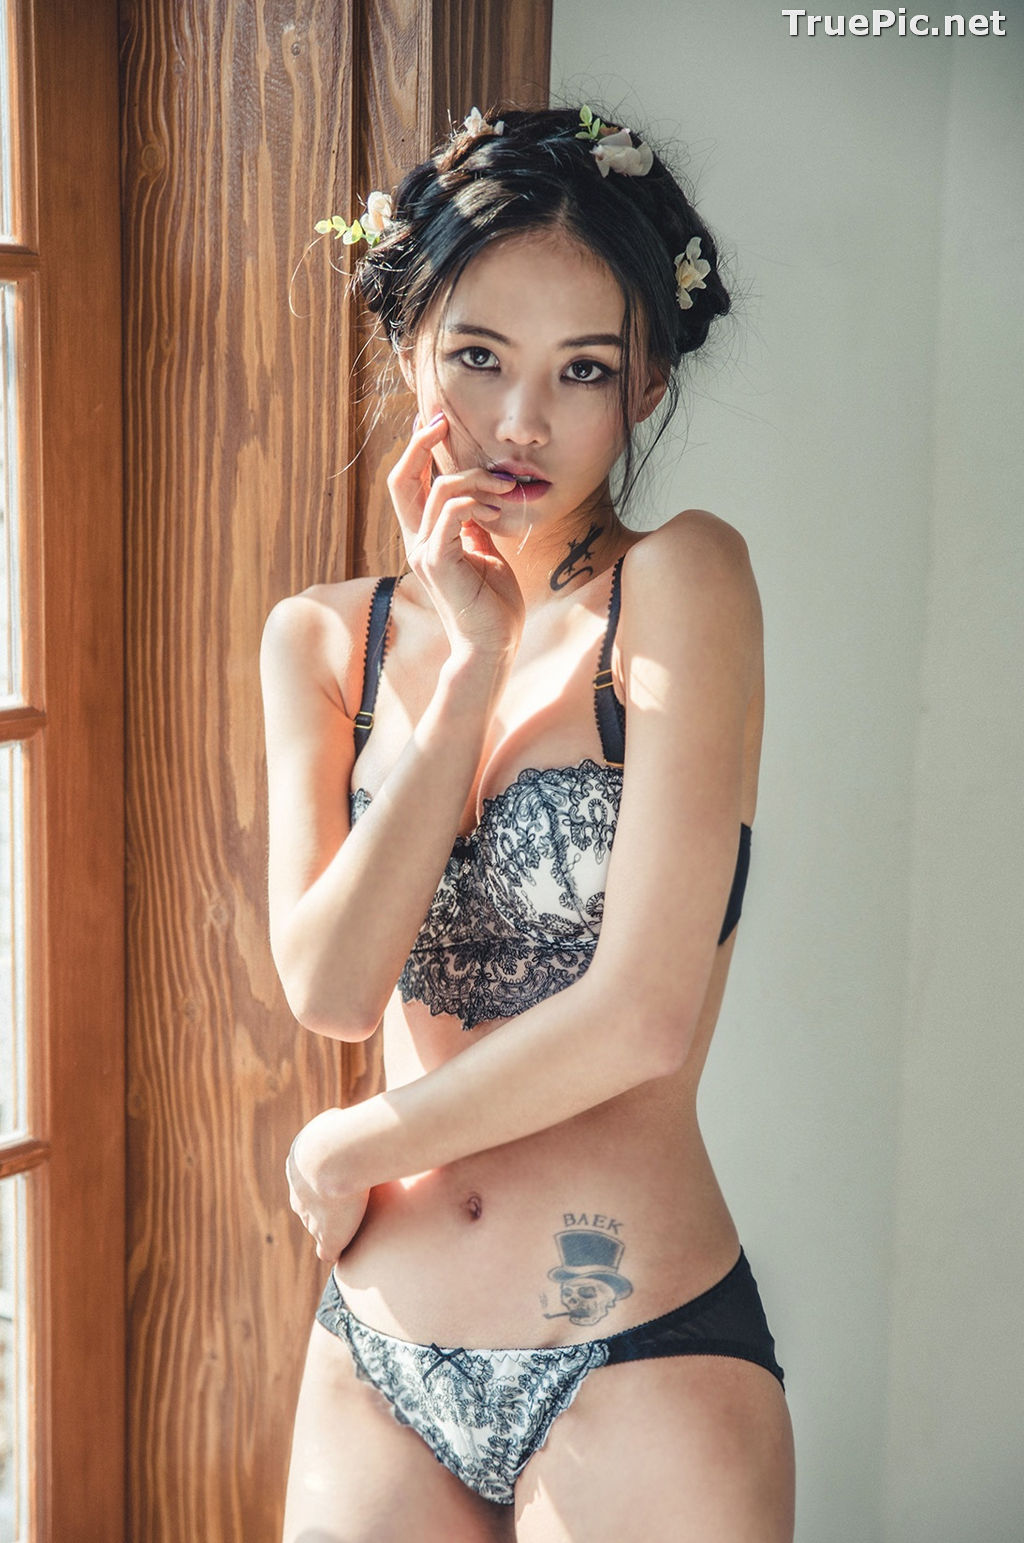 Image Korean Fashion Model – Baek Ye Jin – Sexy Lingerie Collection #7 - TruePic.net - Picture-5